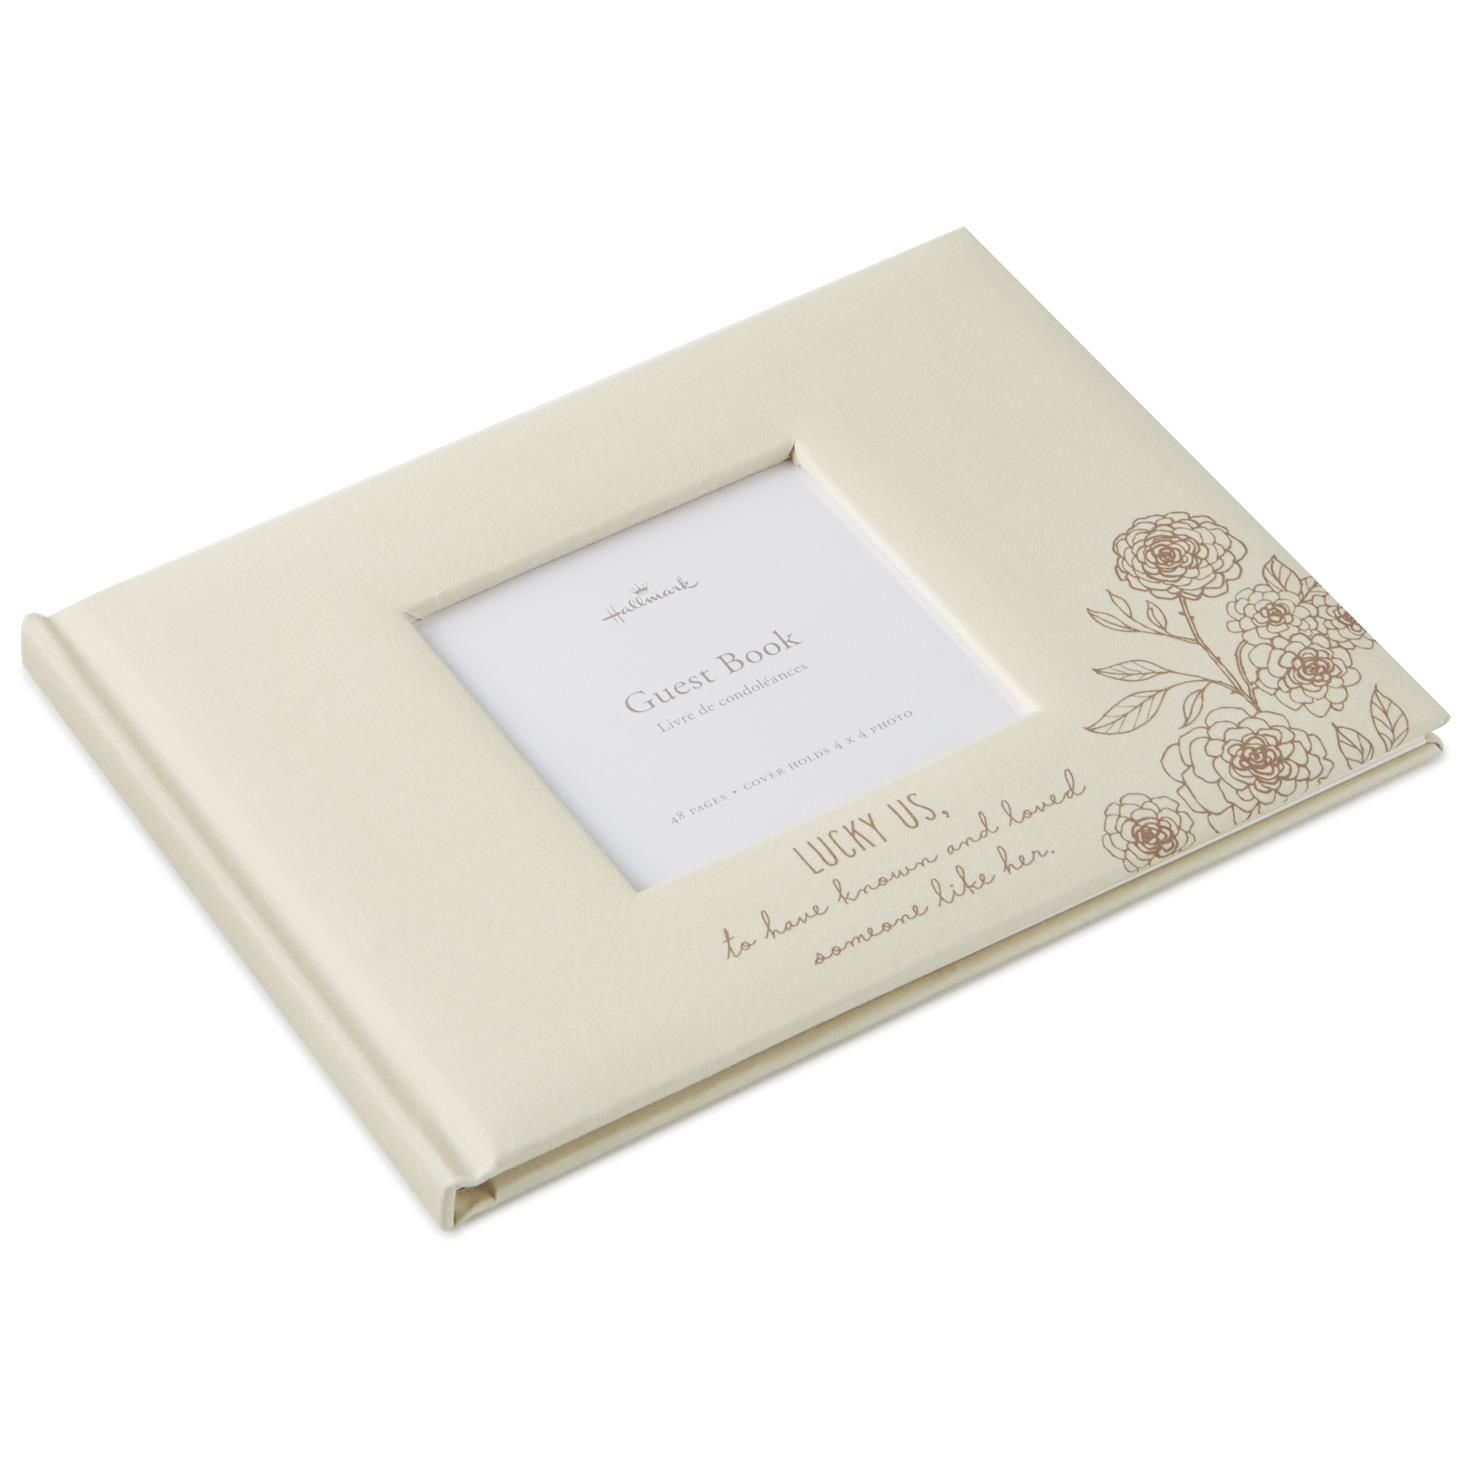 Hallmark Someone Like Her Memorial Guest Book